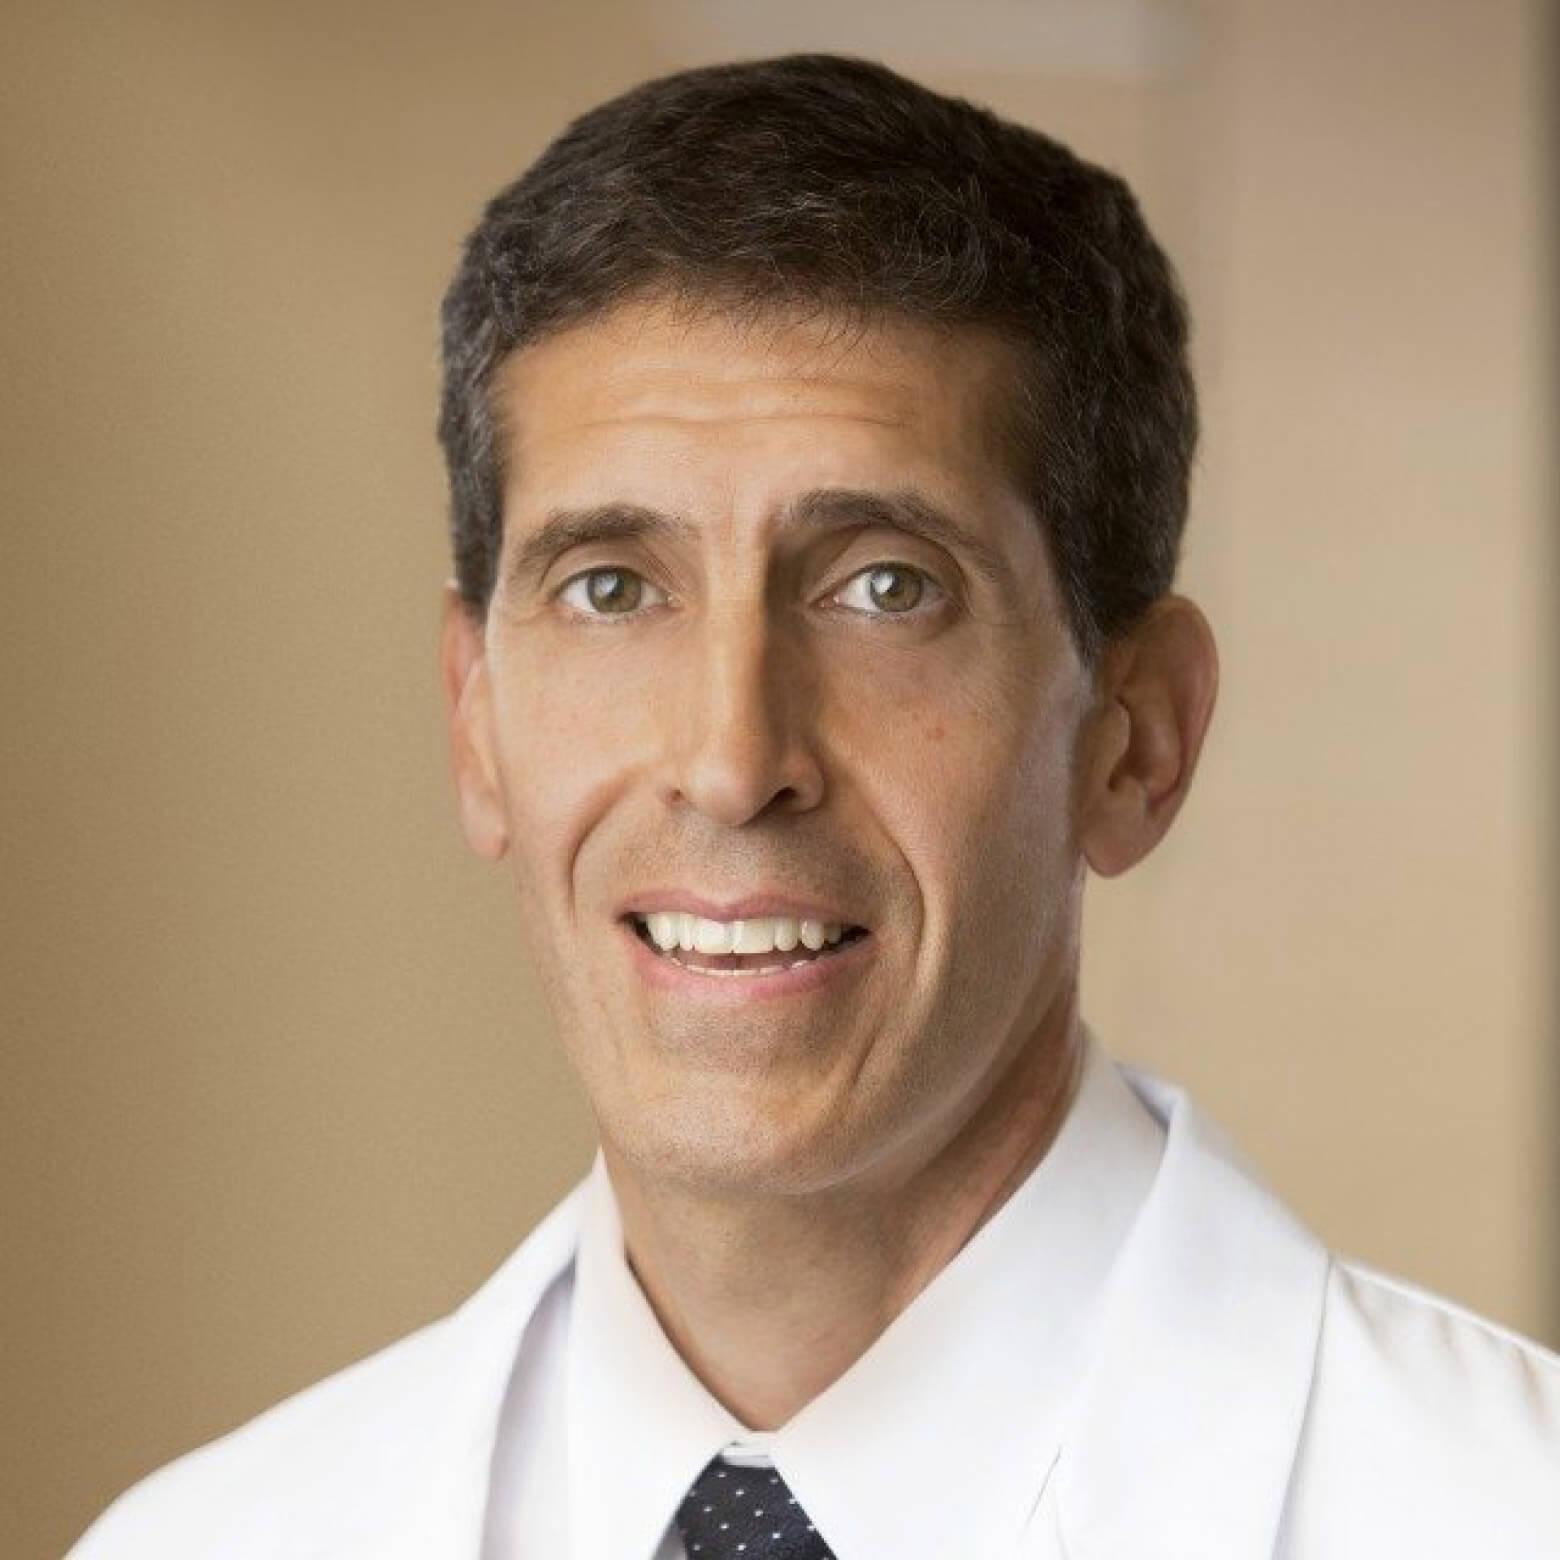 Dr. Paul J. MacKoul, minimally invasive GYN surgeon